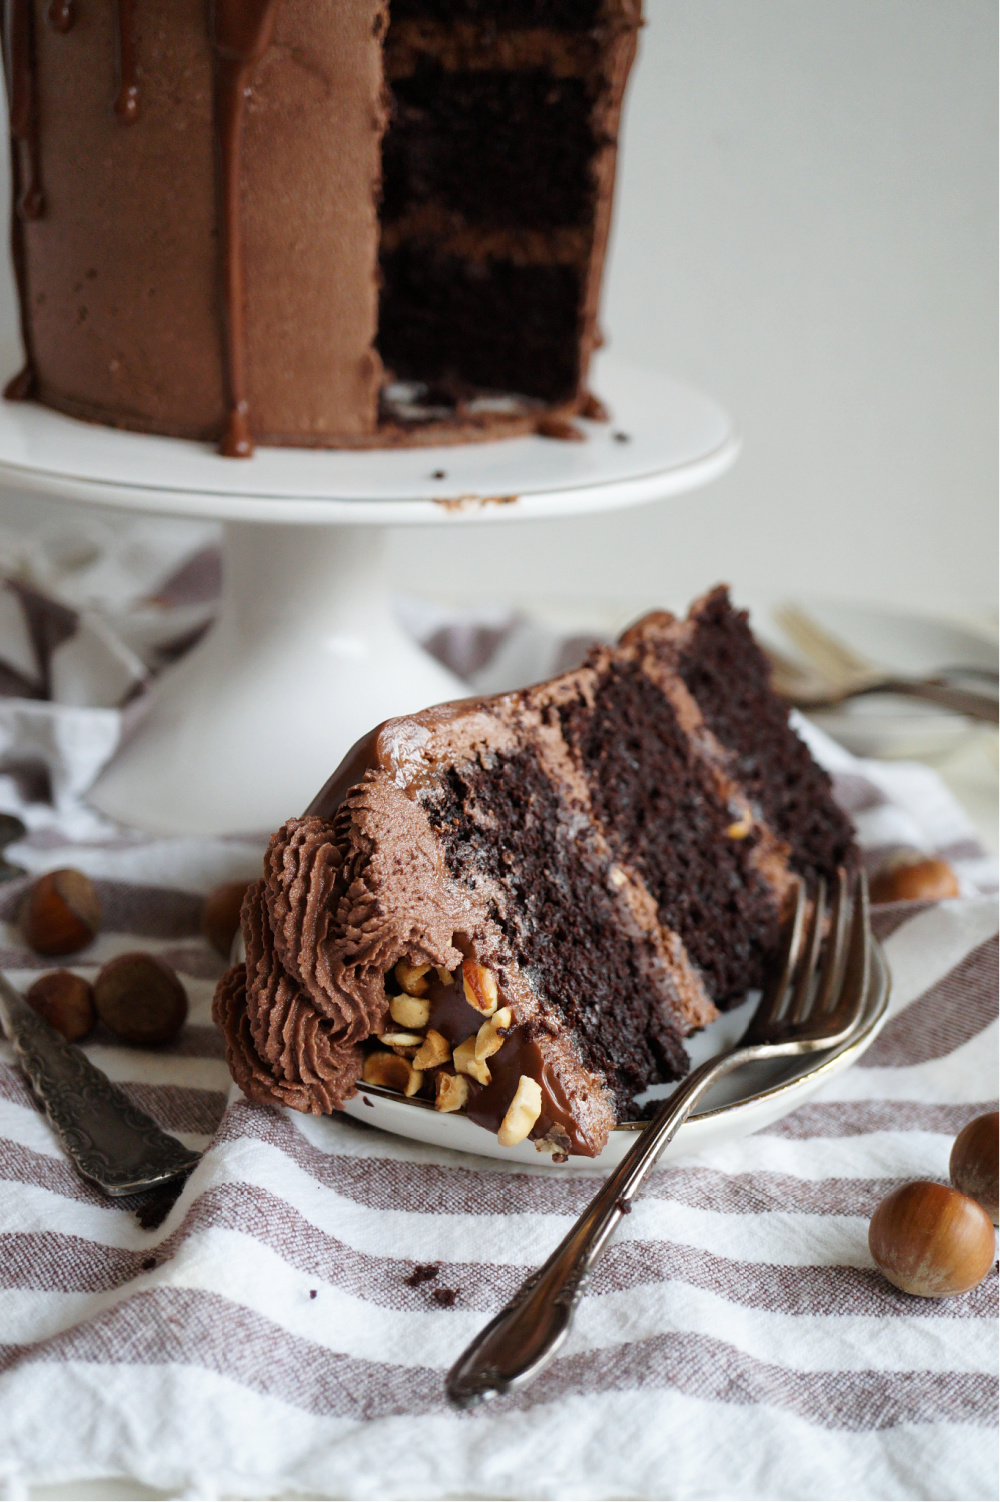 slice of chocolate hazelnut cake on plate